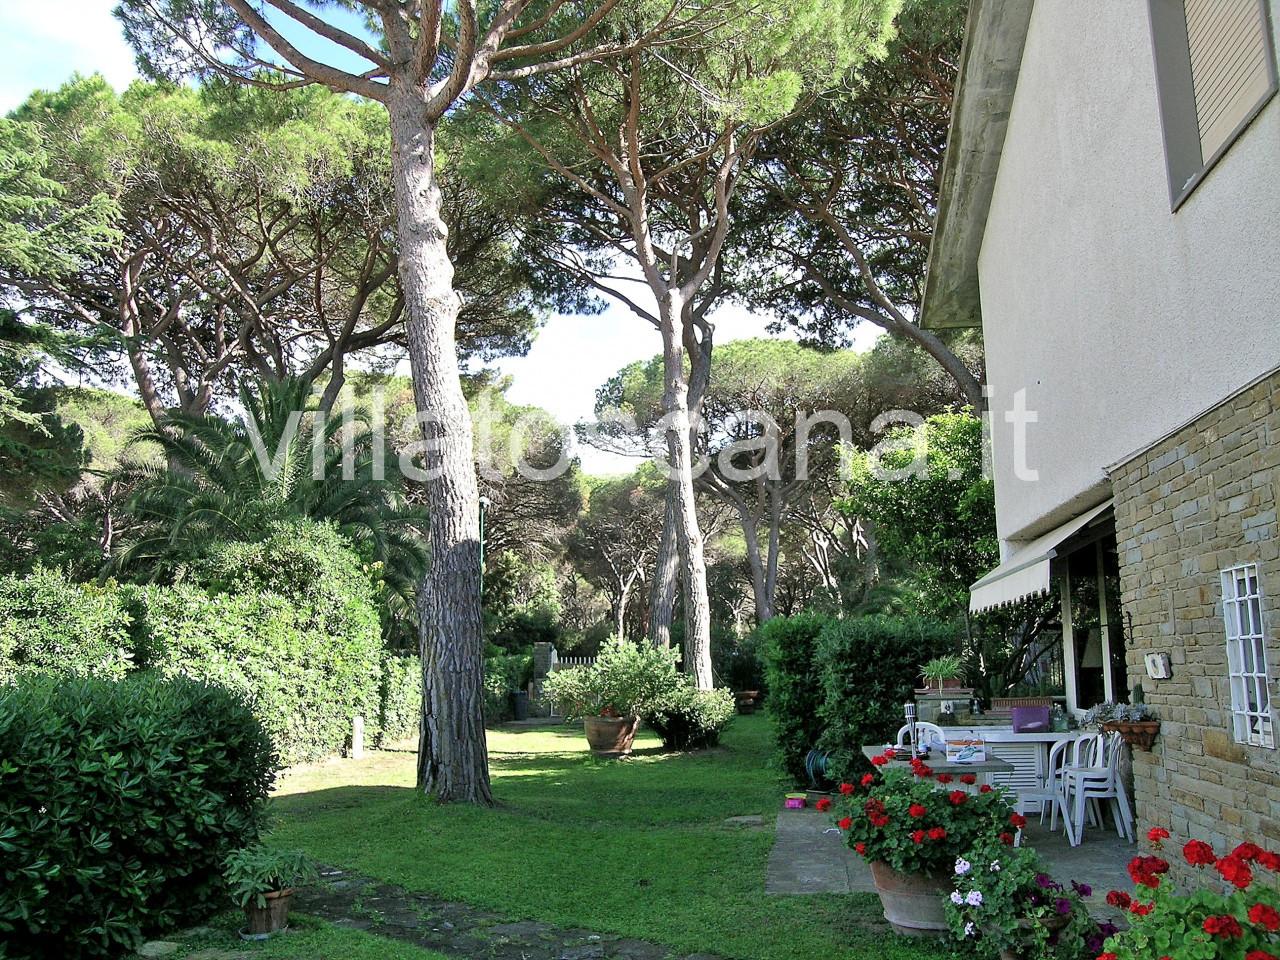 Appartamento padronale con giardino